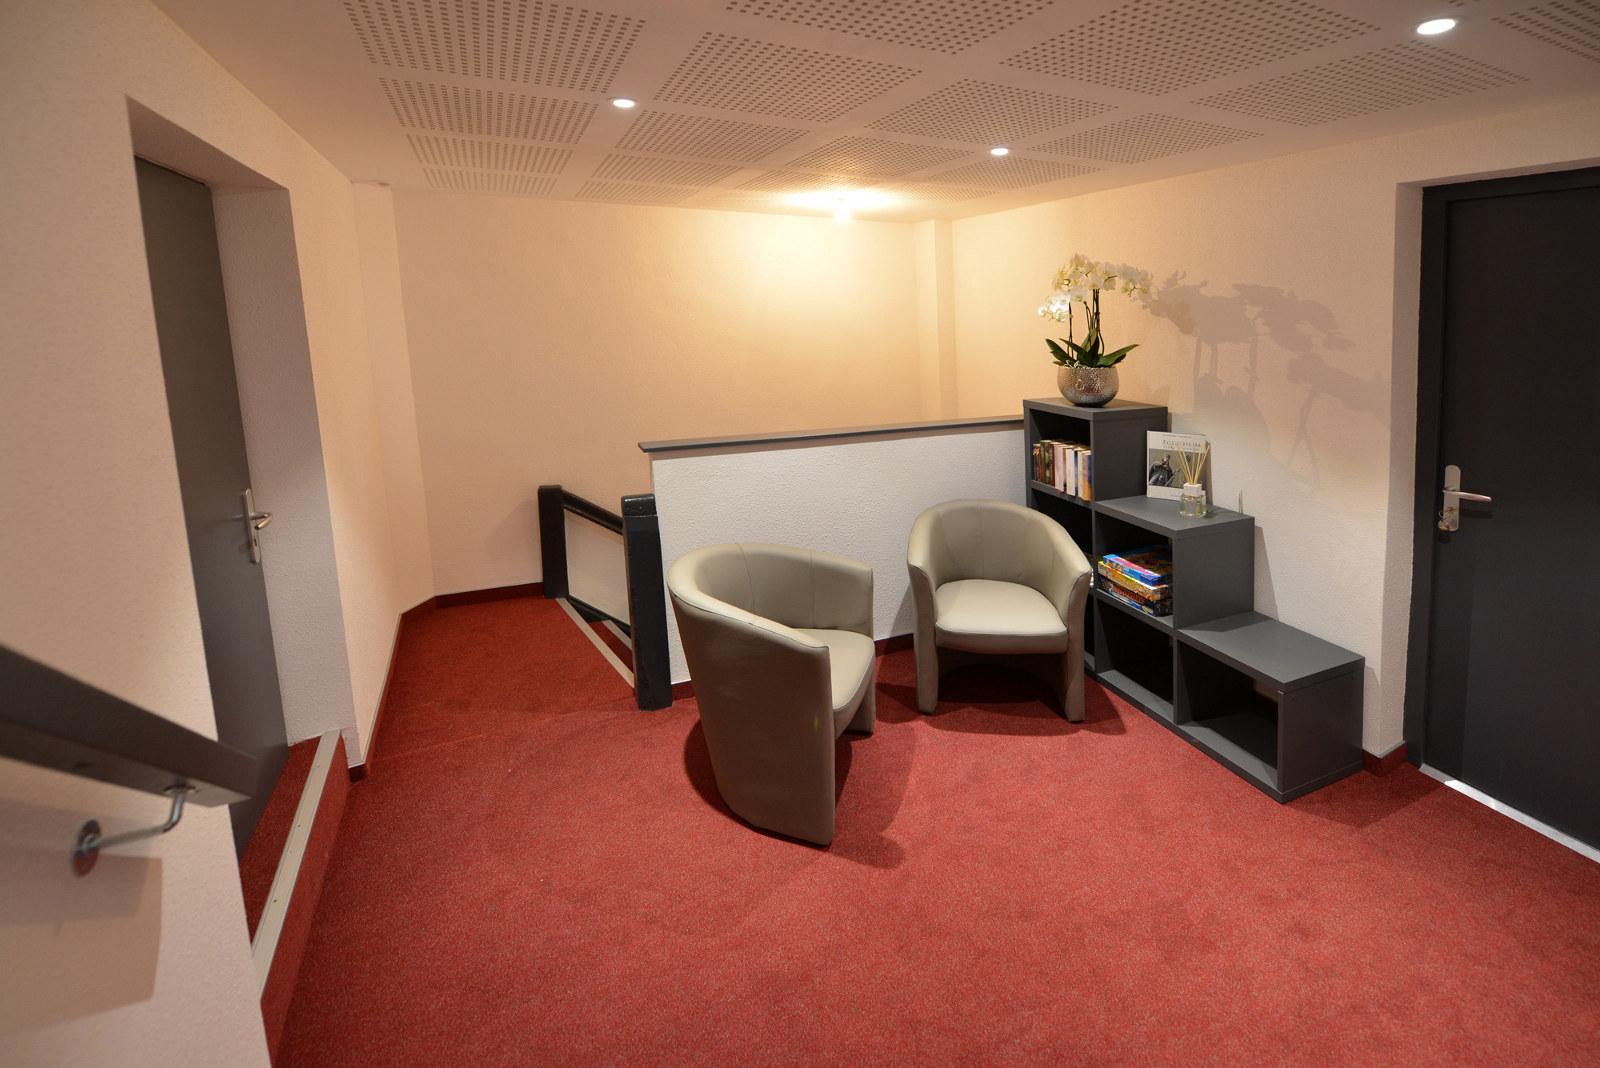 meubl fetiaura ch teau fleuri 5 place du ch teau 68420 eguisheim france. Black Bedroom Furniture Sets. Home Design Ideas